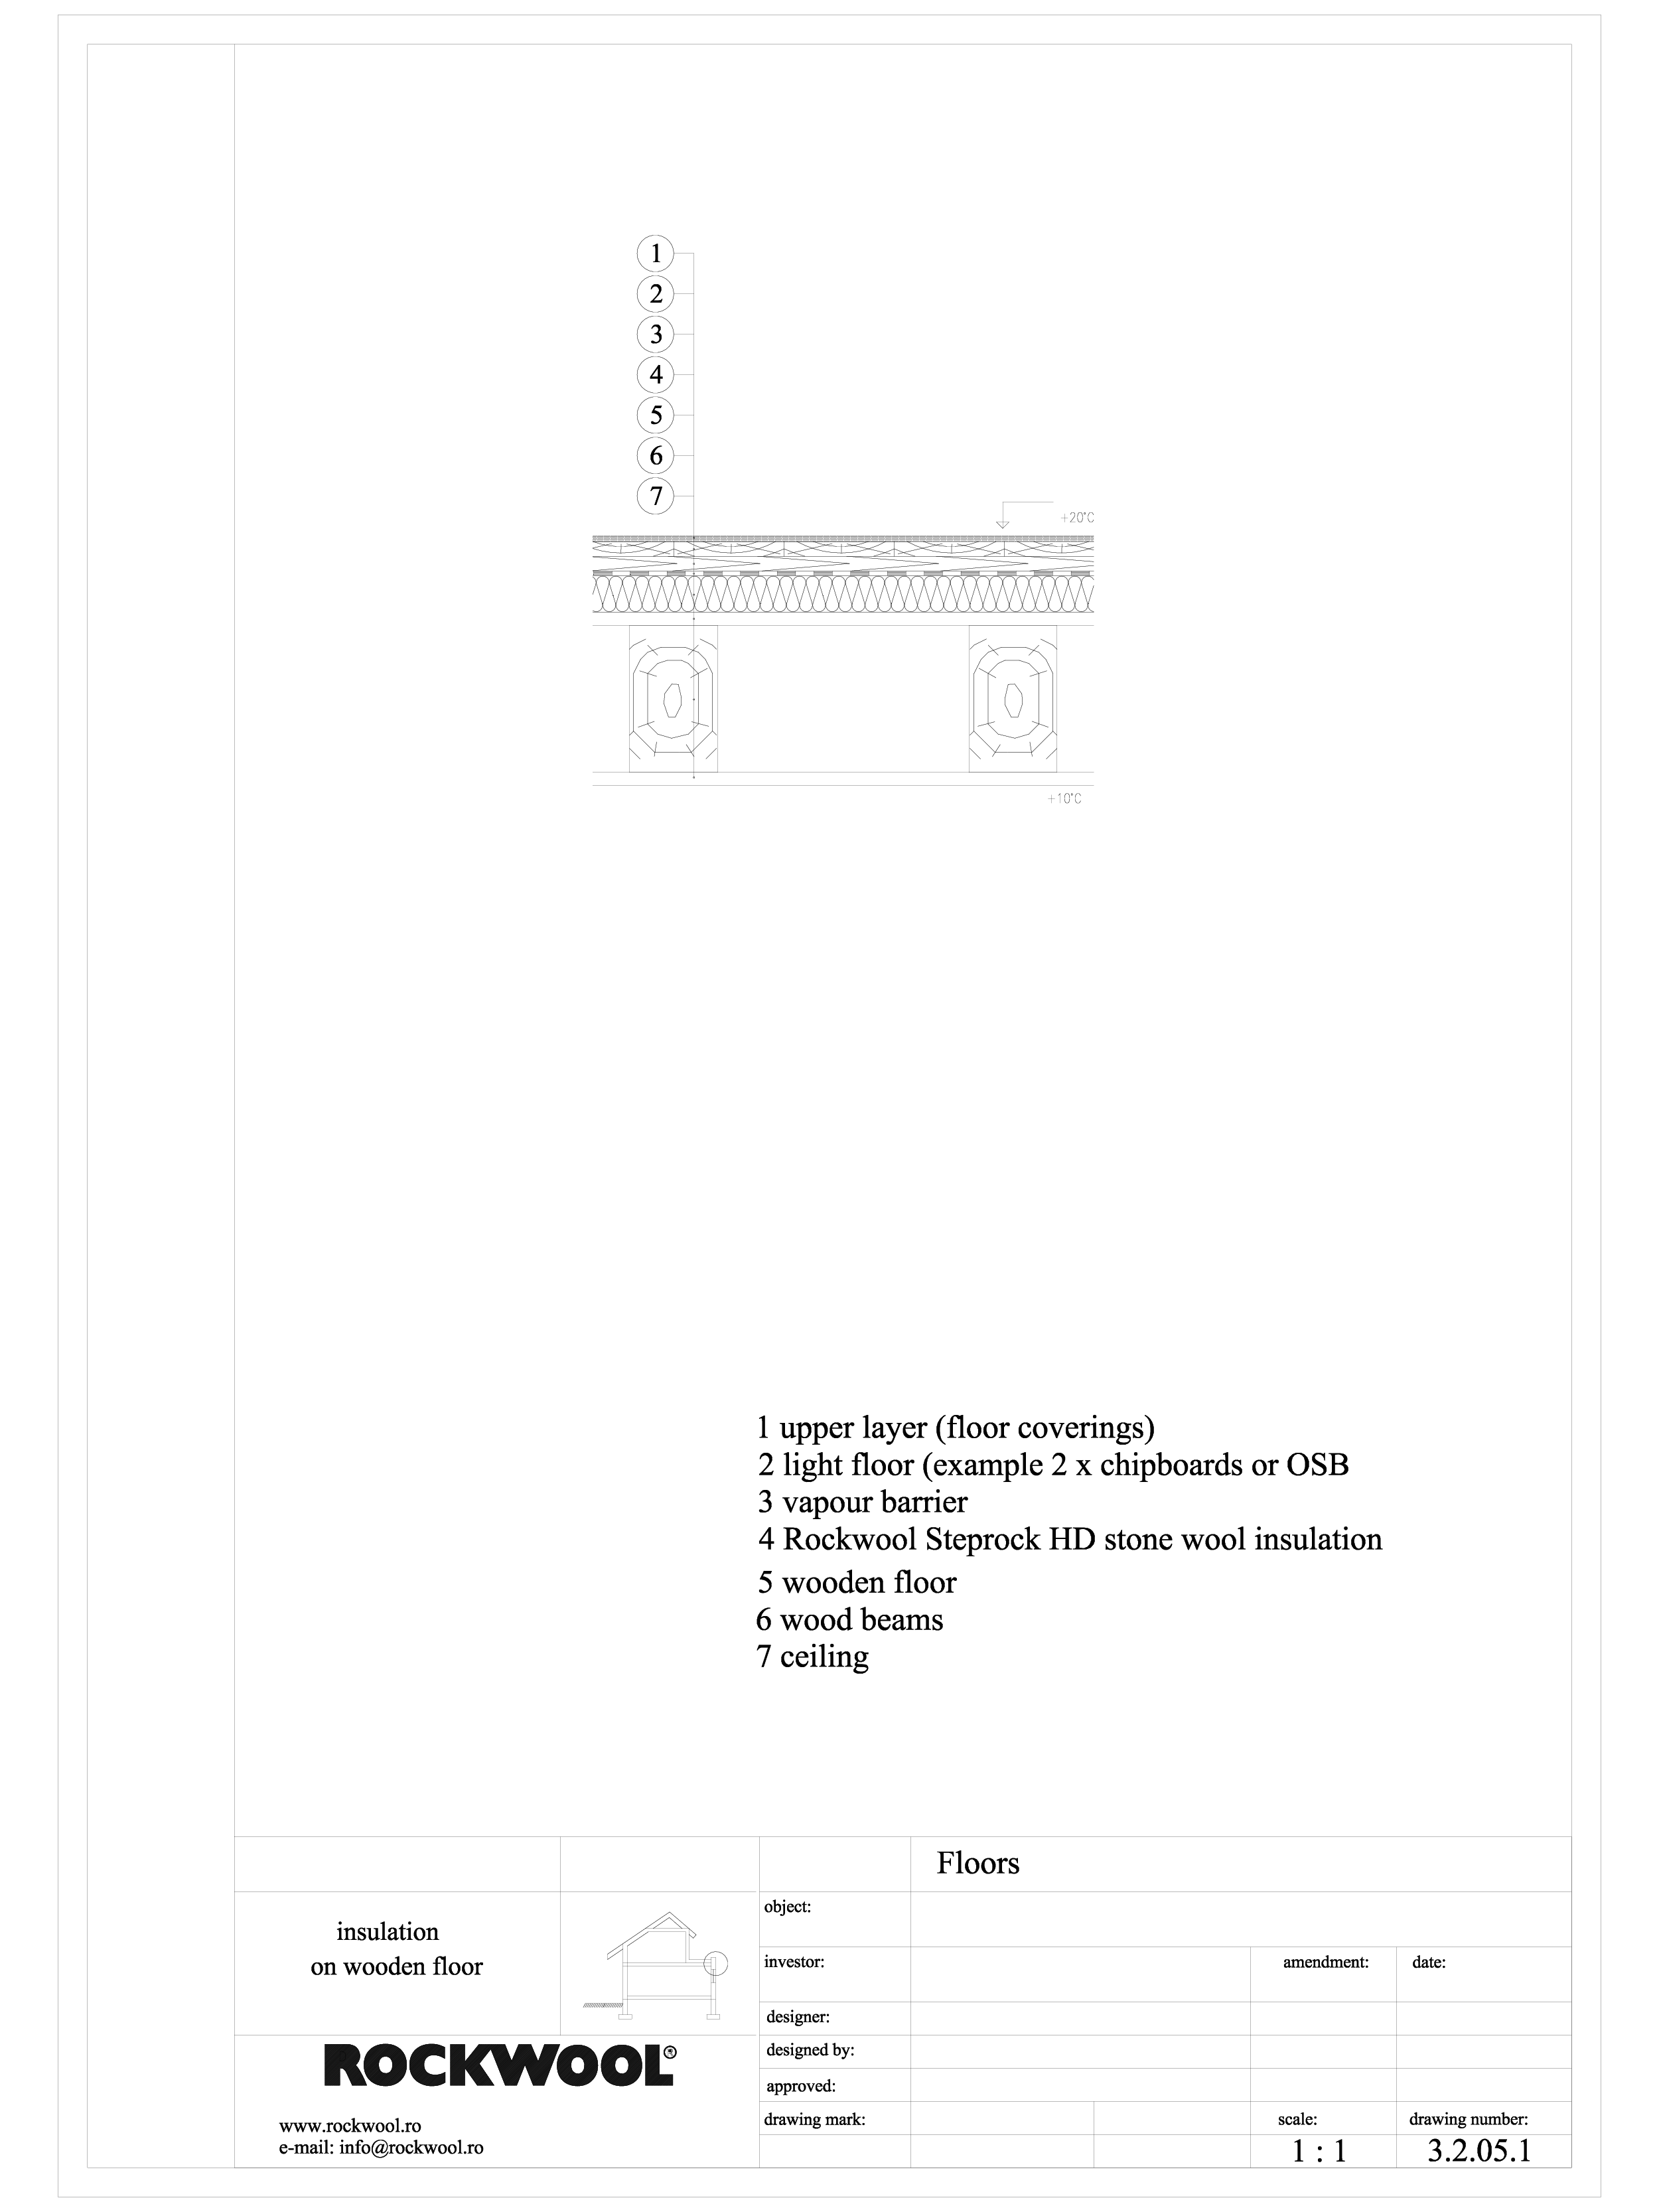 Termoizolarea pardoselilor - detaliu termoizolare, pardoseala pe structura de lemn ROCKWOOL Termoizolatie vata bazaltica pentru pardoseli ROCKWOOL ROMANIA  - Pagina 1